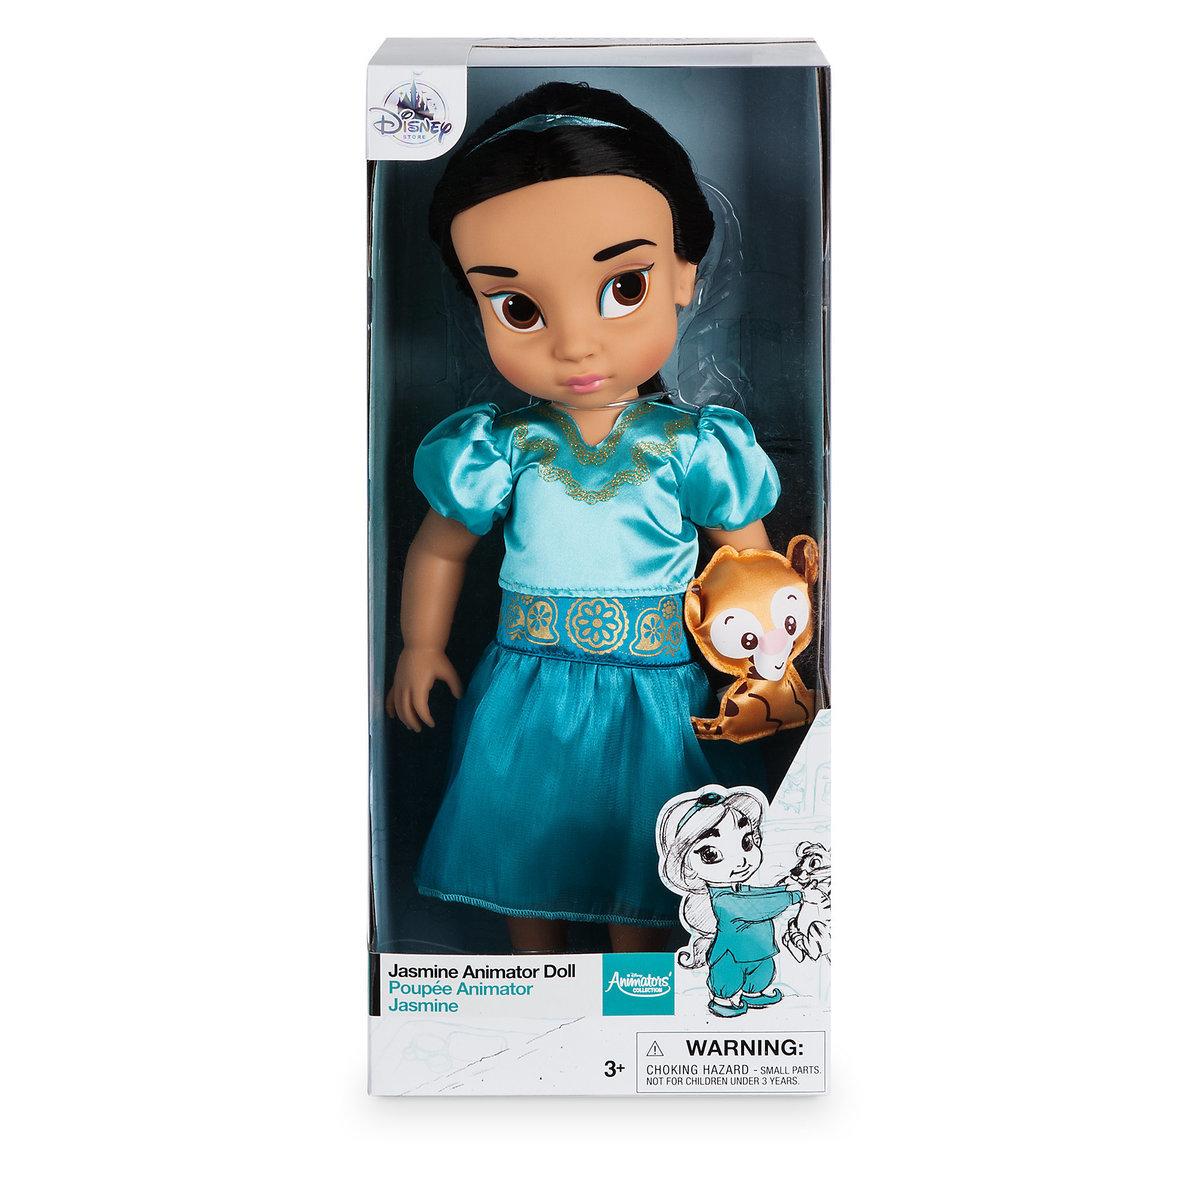 Disney Animators' Collection Jasmine Doll - 16'' ของแท้ นำเข้าจากอเมริกา